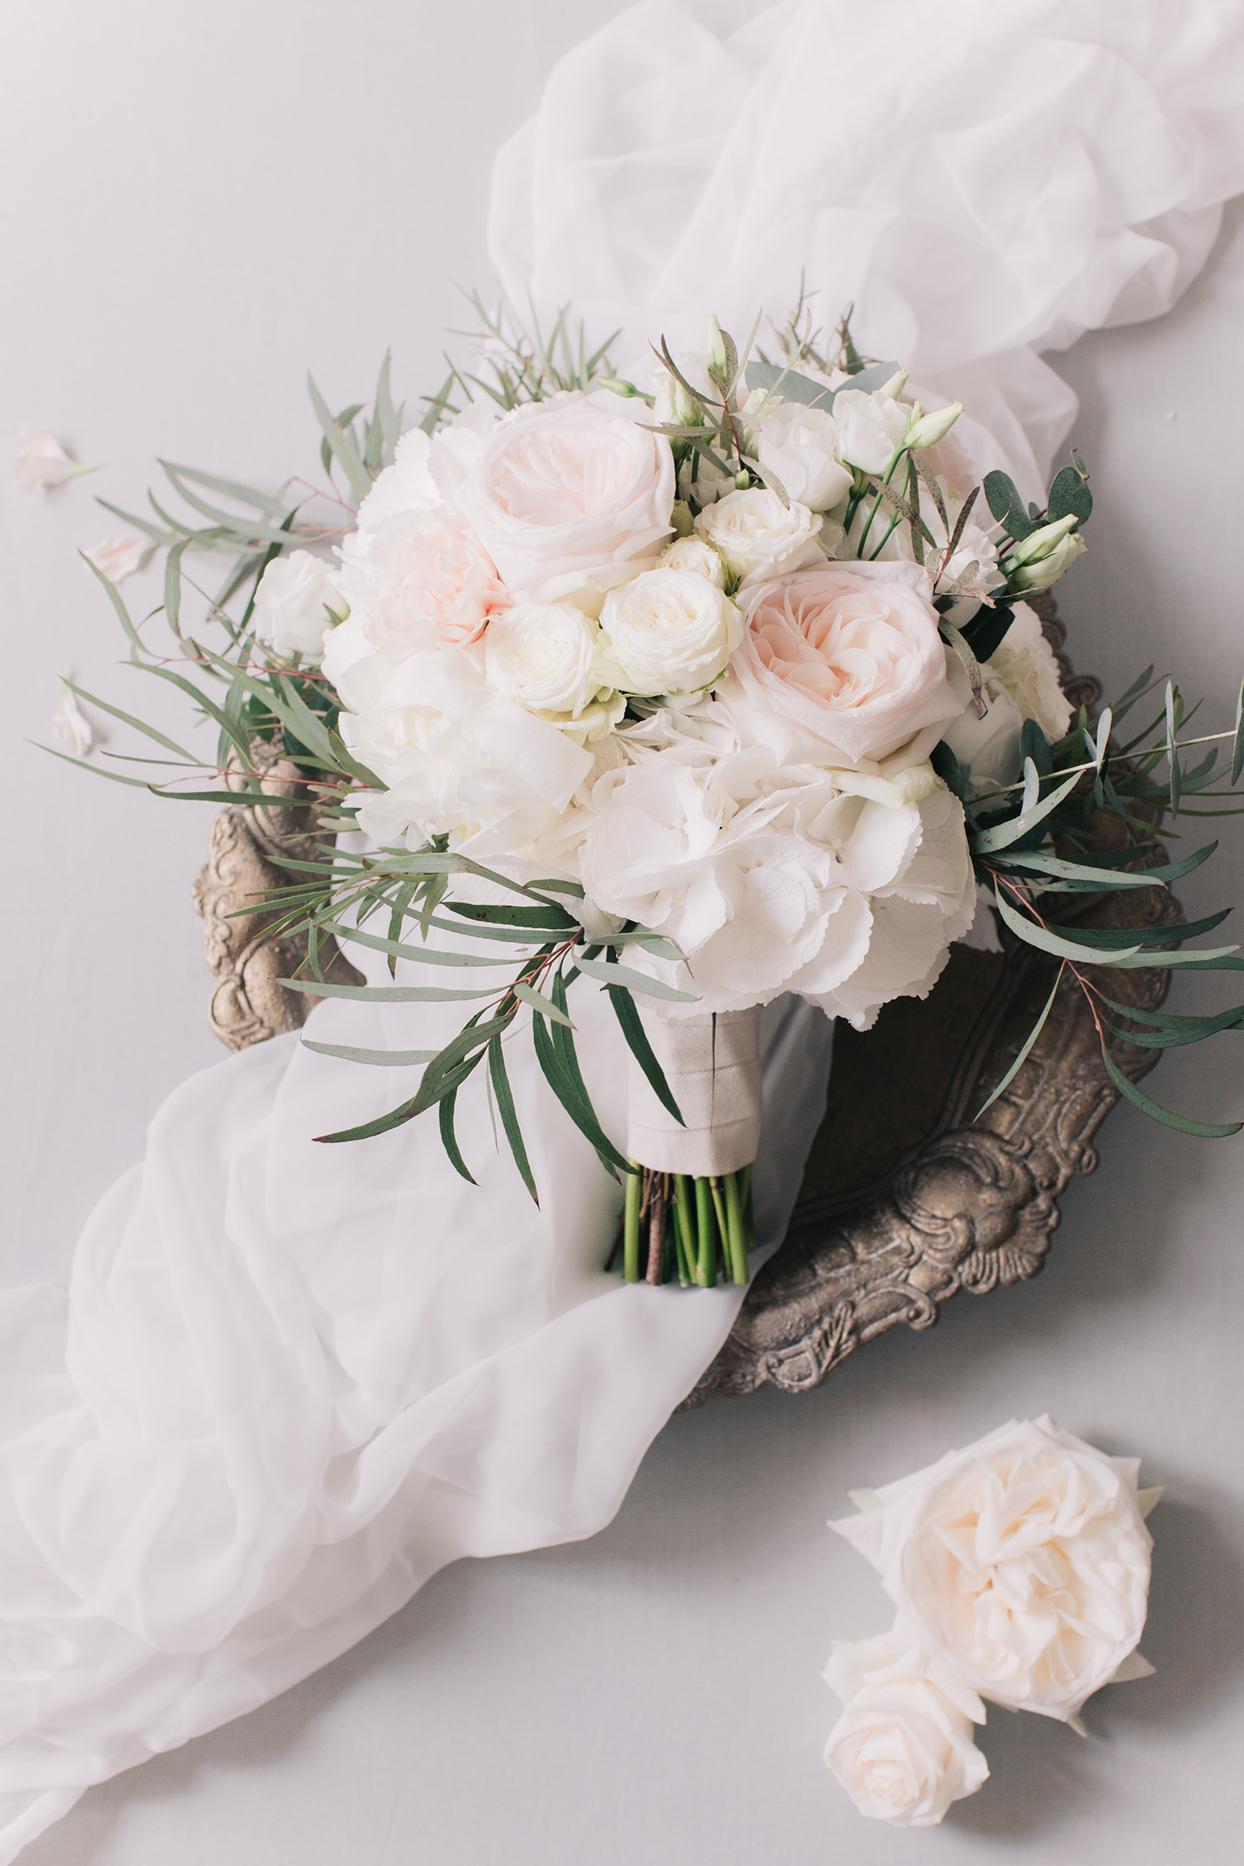 kiira arthur wedding pastel pink and white roses bouquet